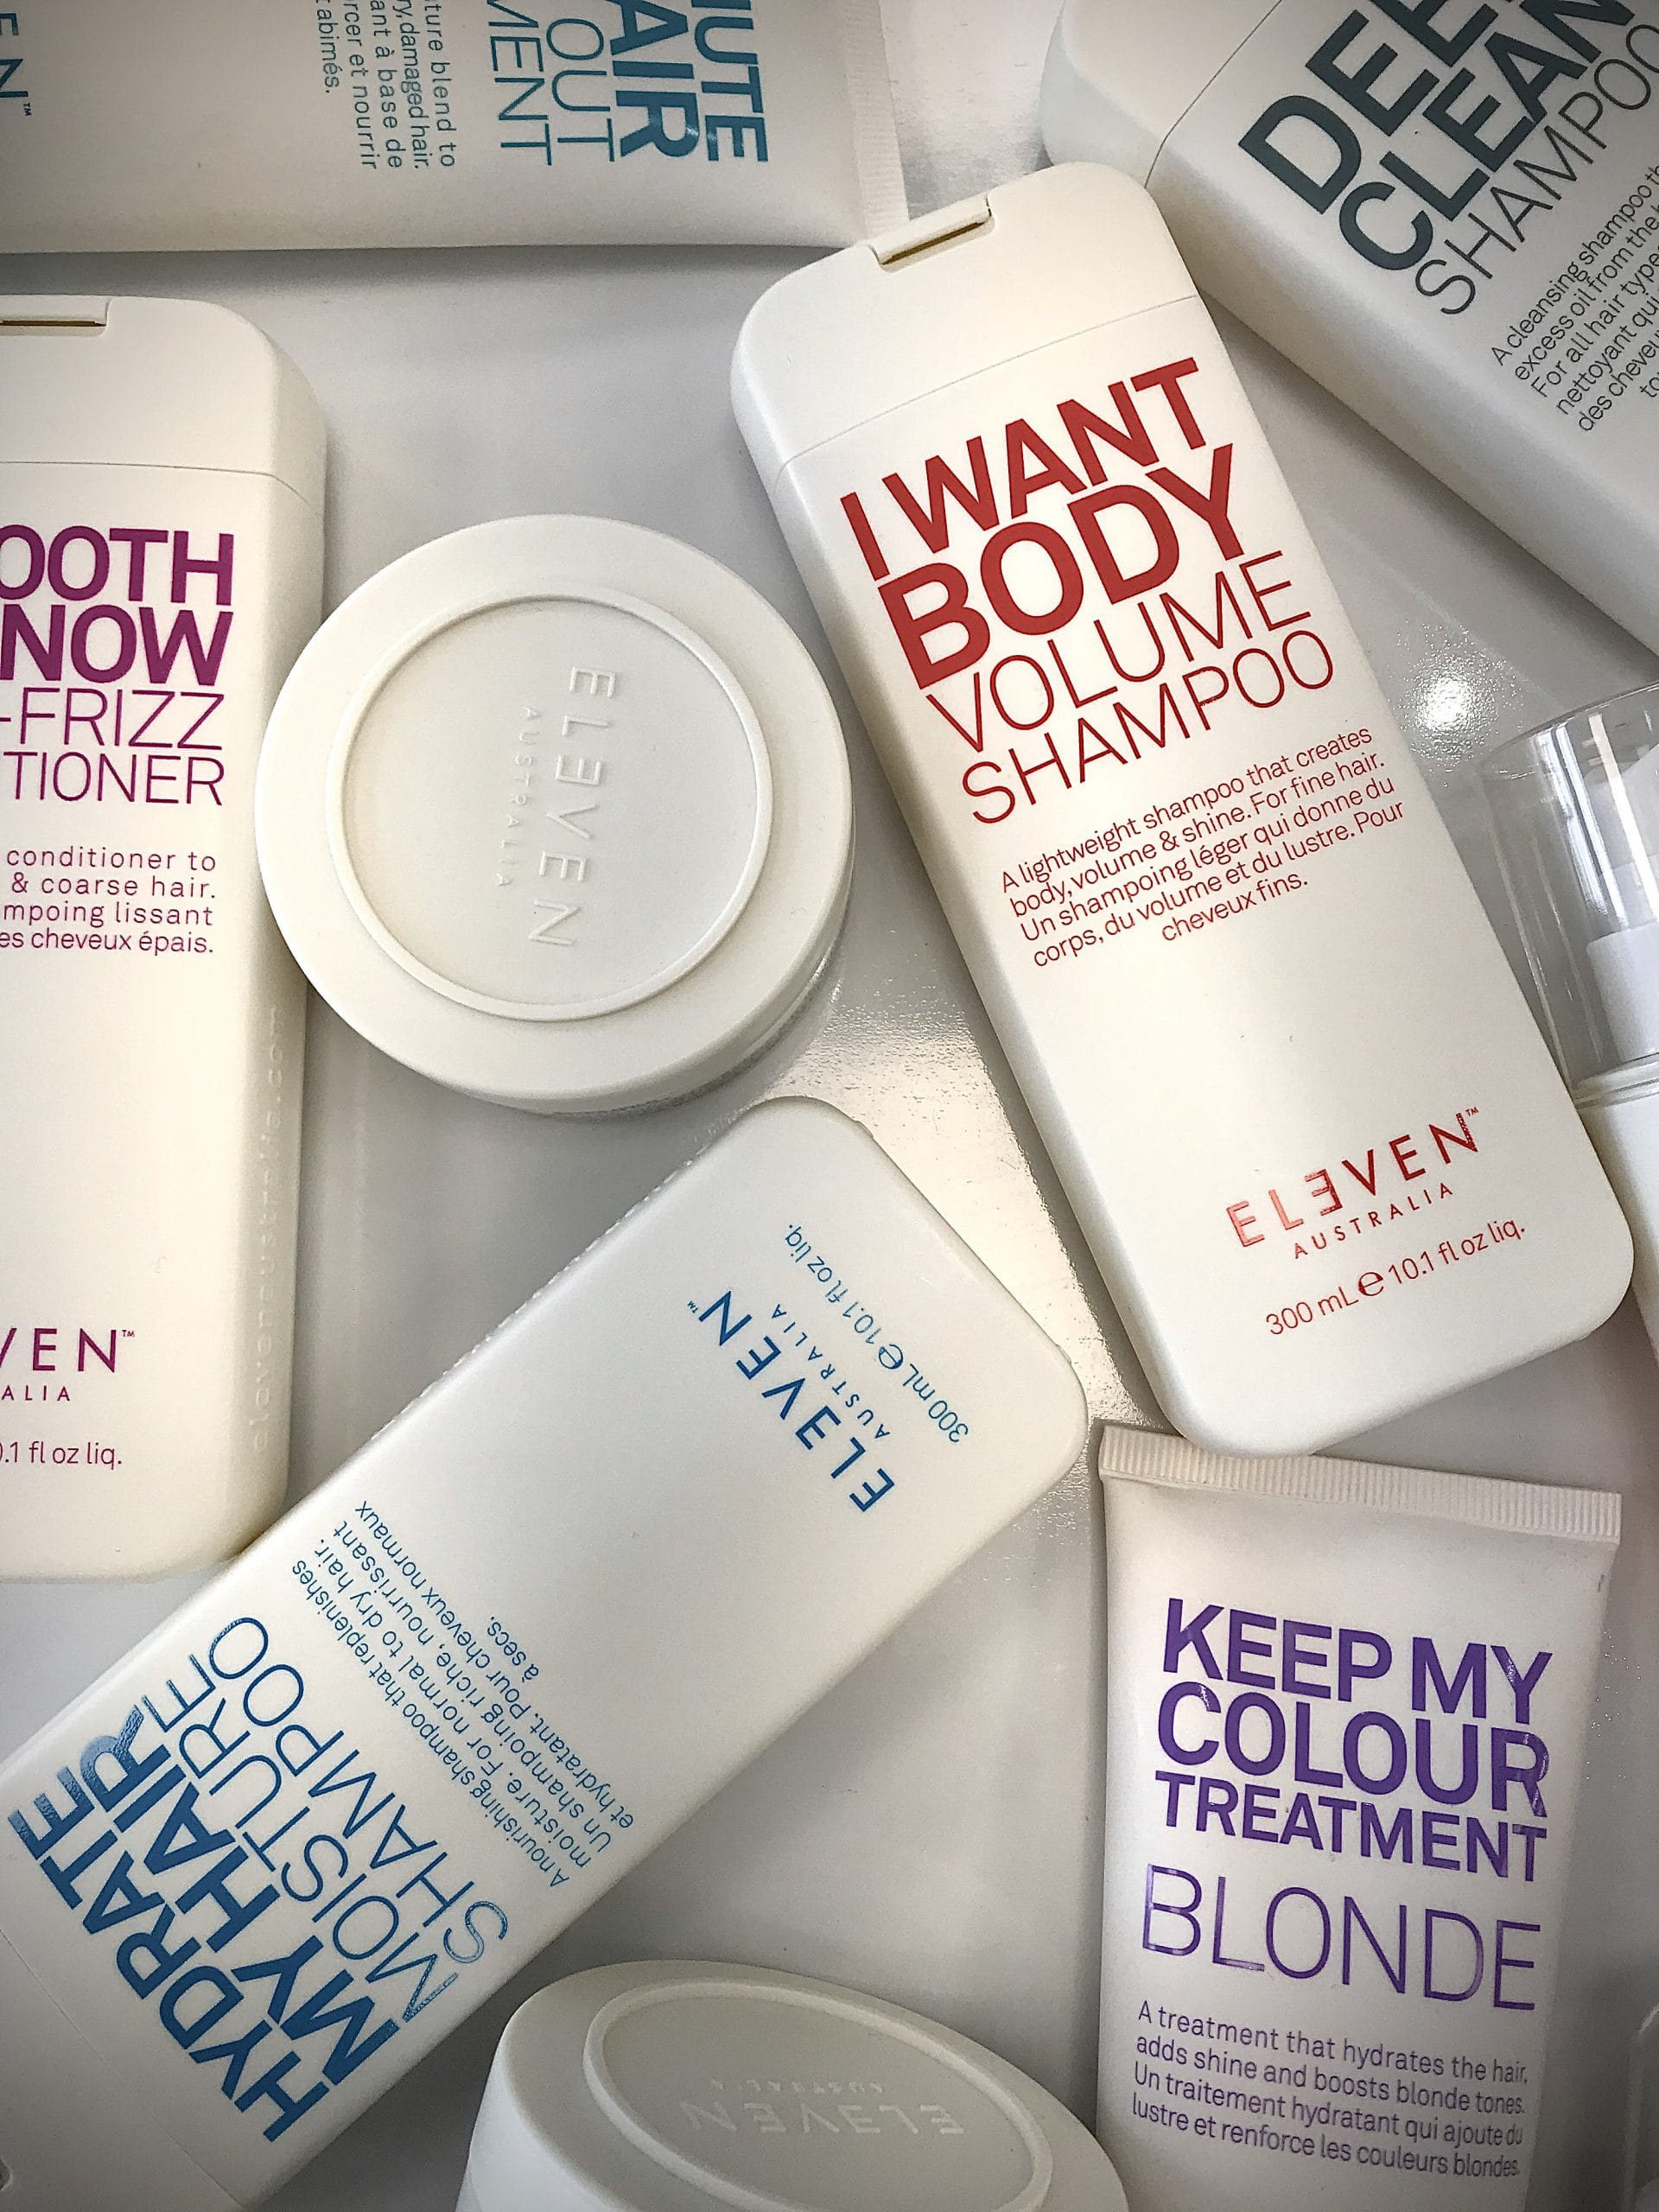 Eleven Australia products.